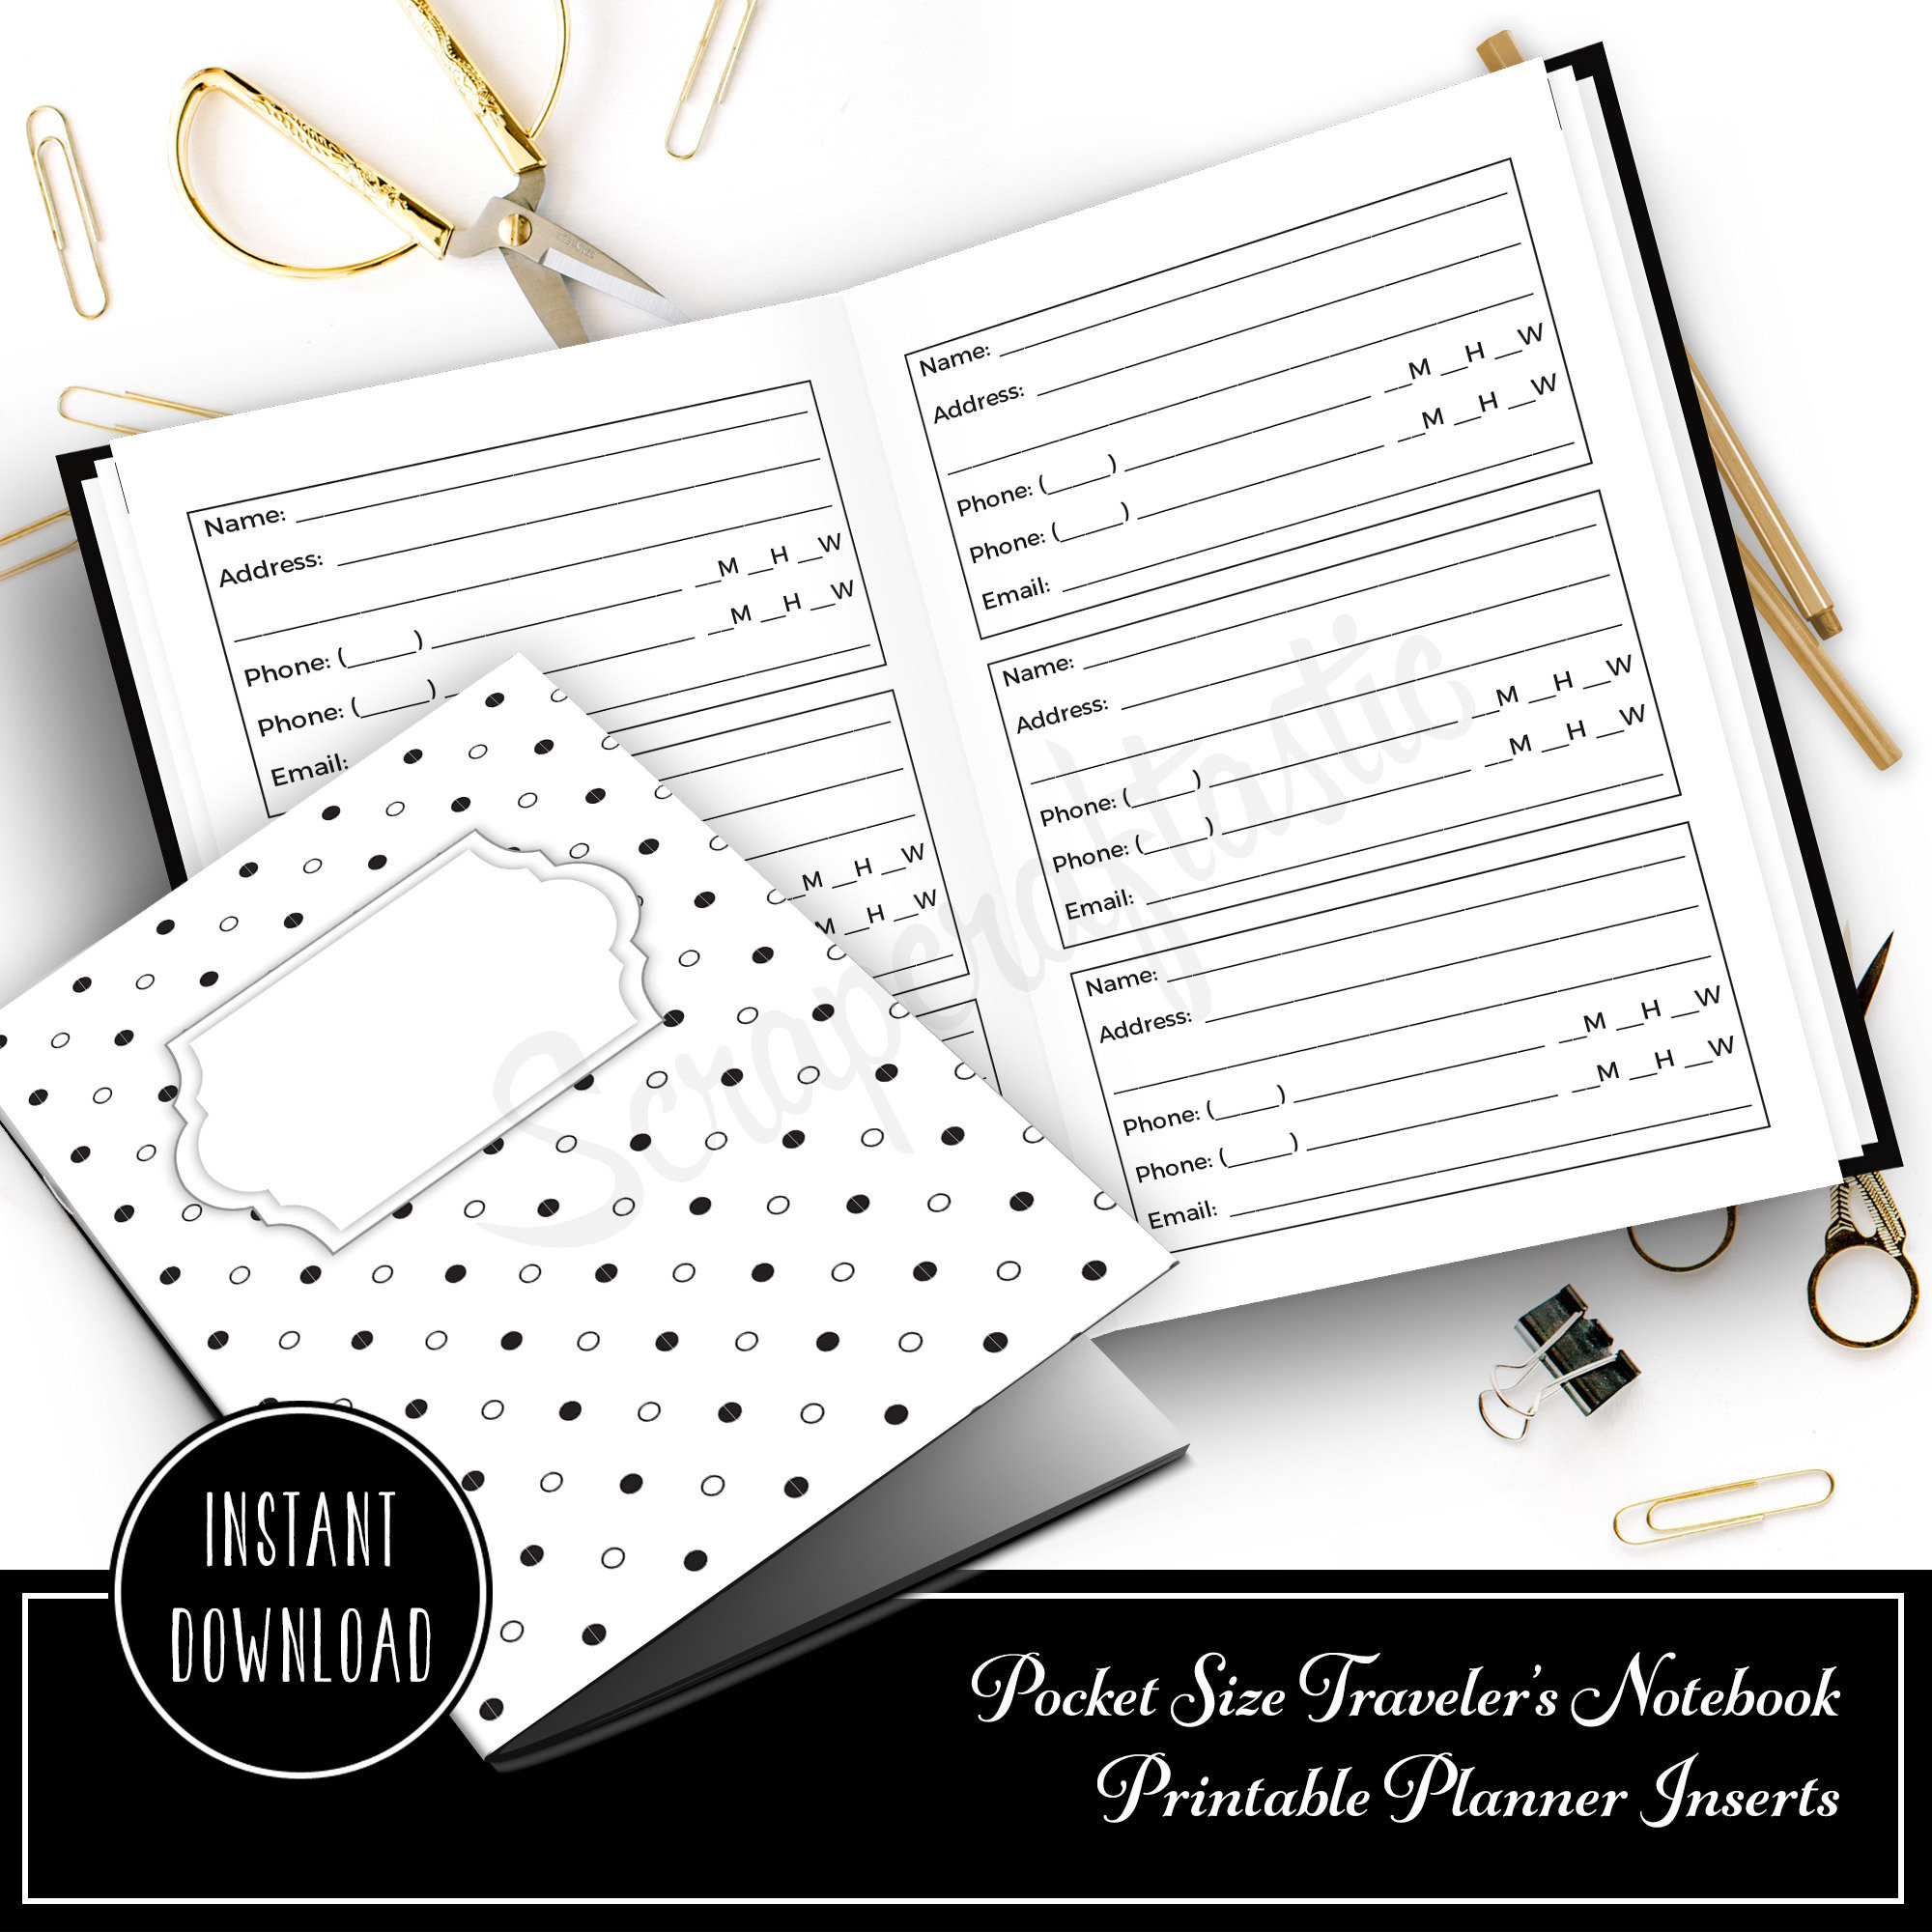 Address and Phone Log Pocket Size Traveler's Notebook Printable Planner Inserts 10019